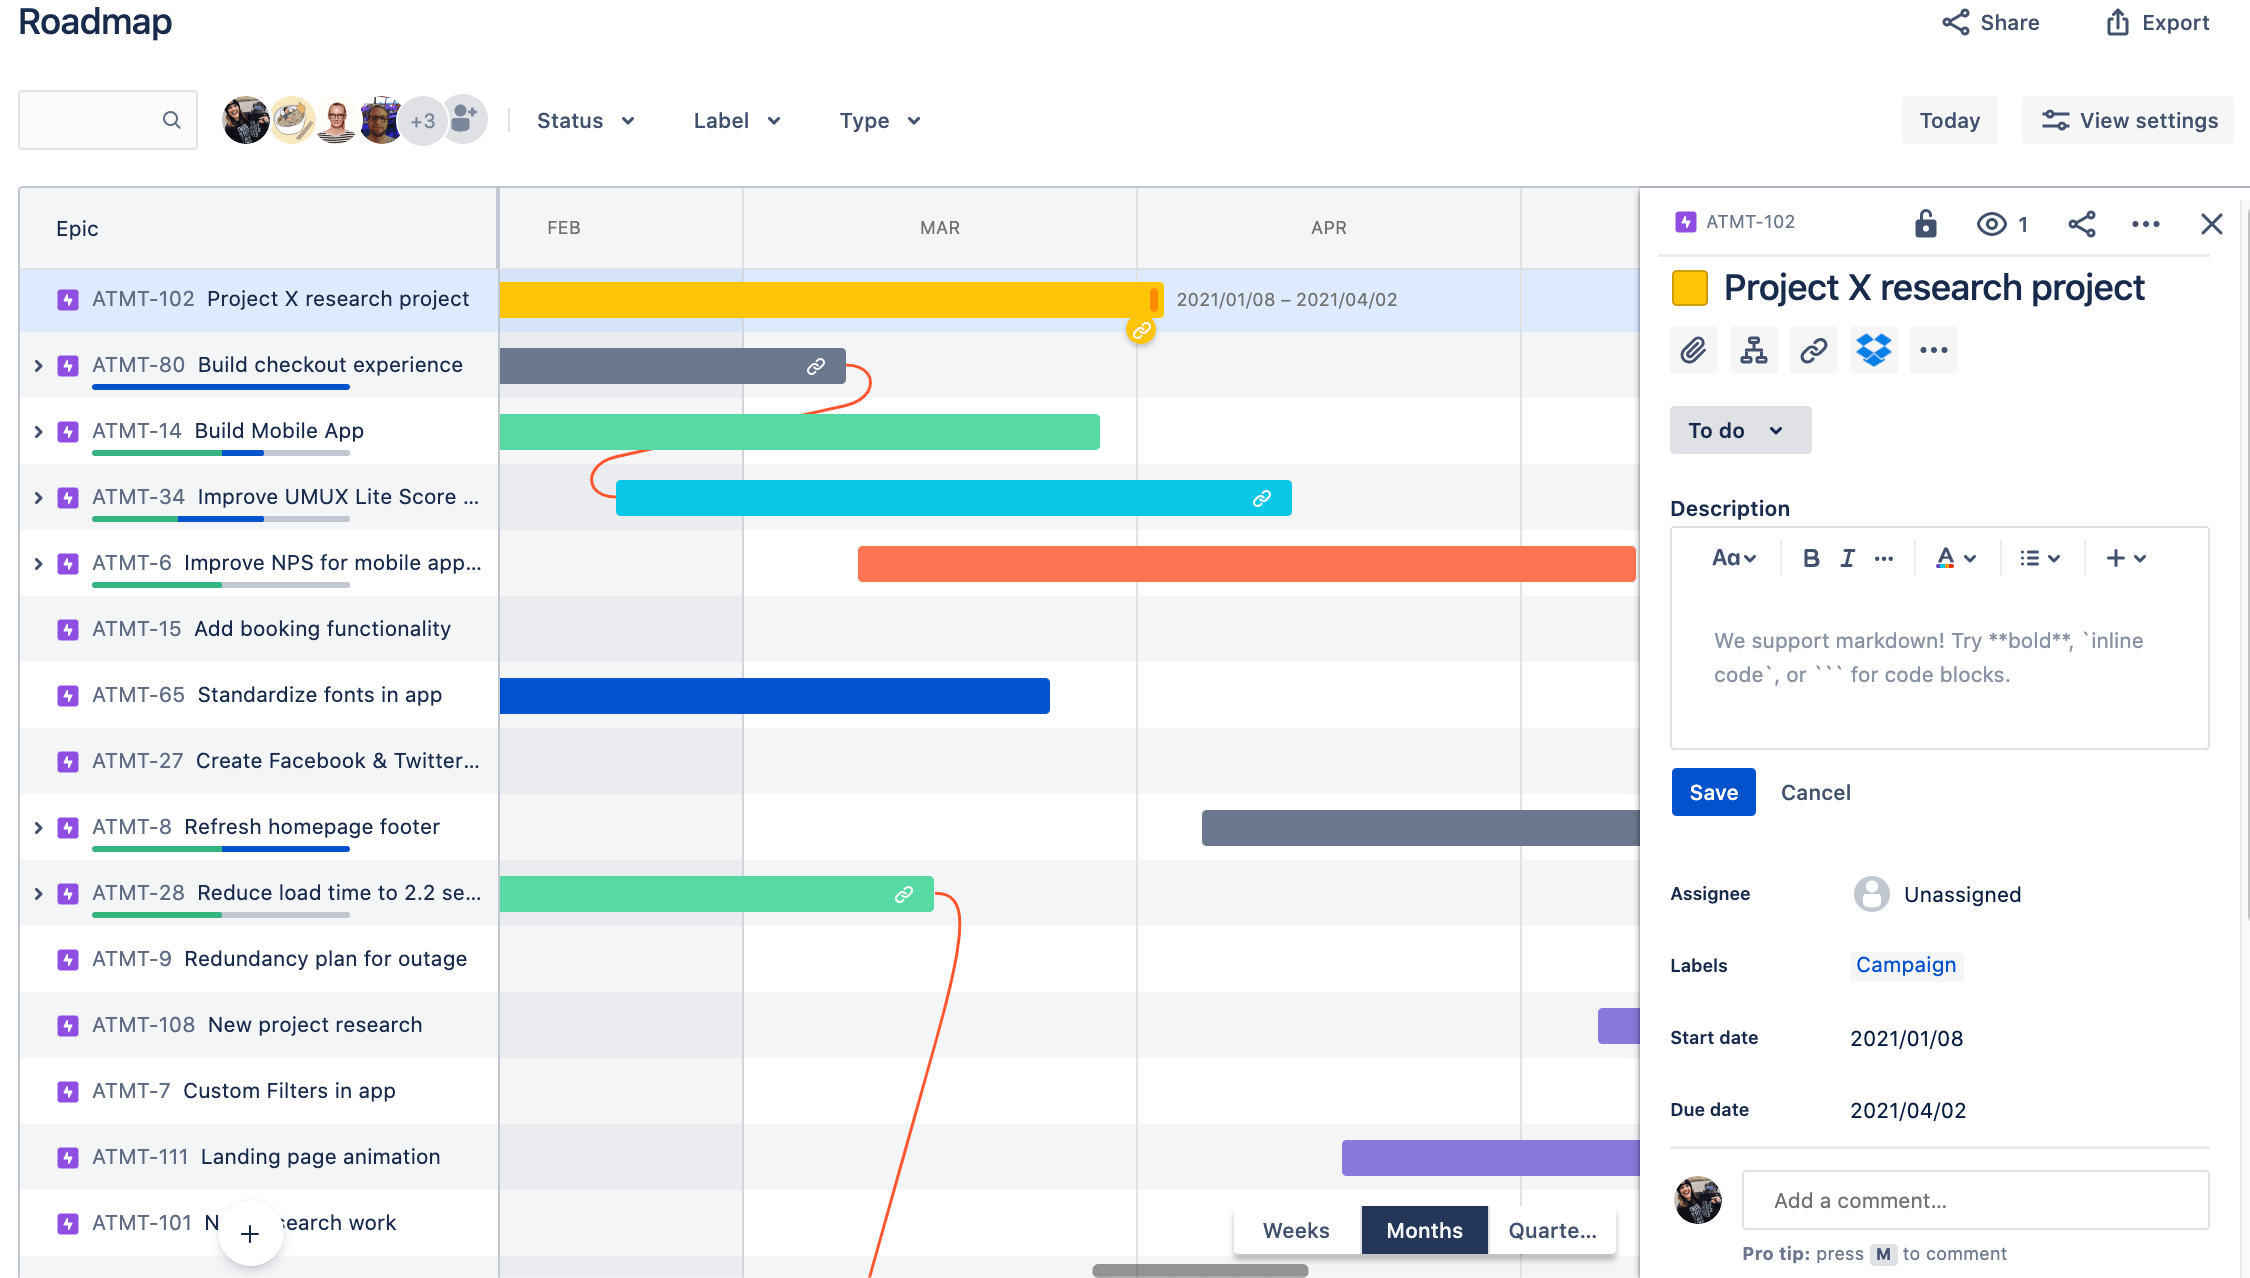 Jira Software Basic Roadmaps 上的长篇故事开始和结束日期